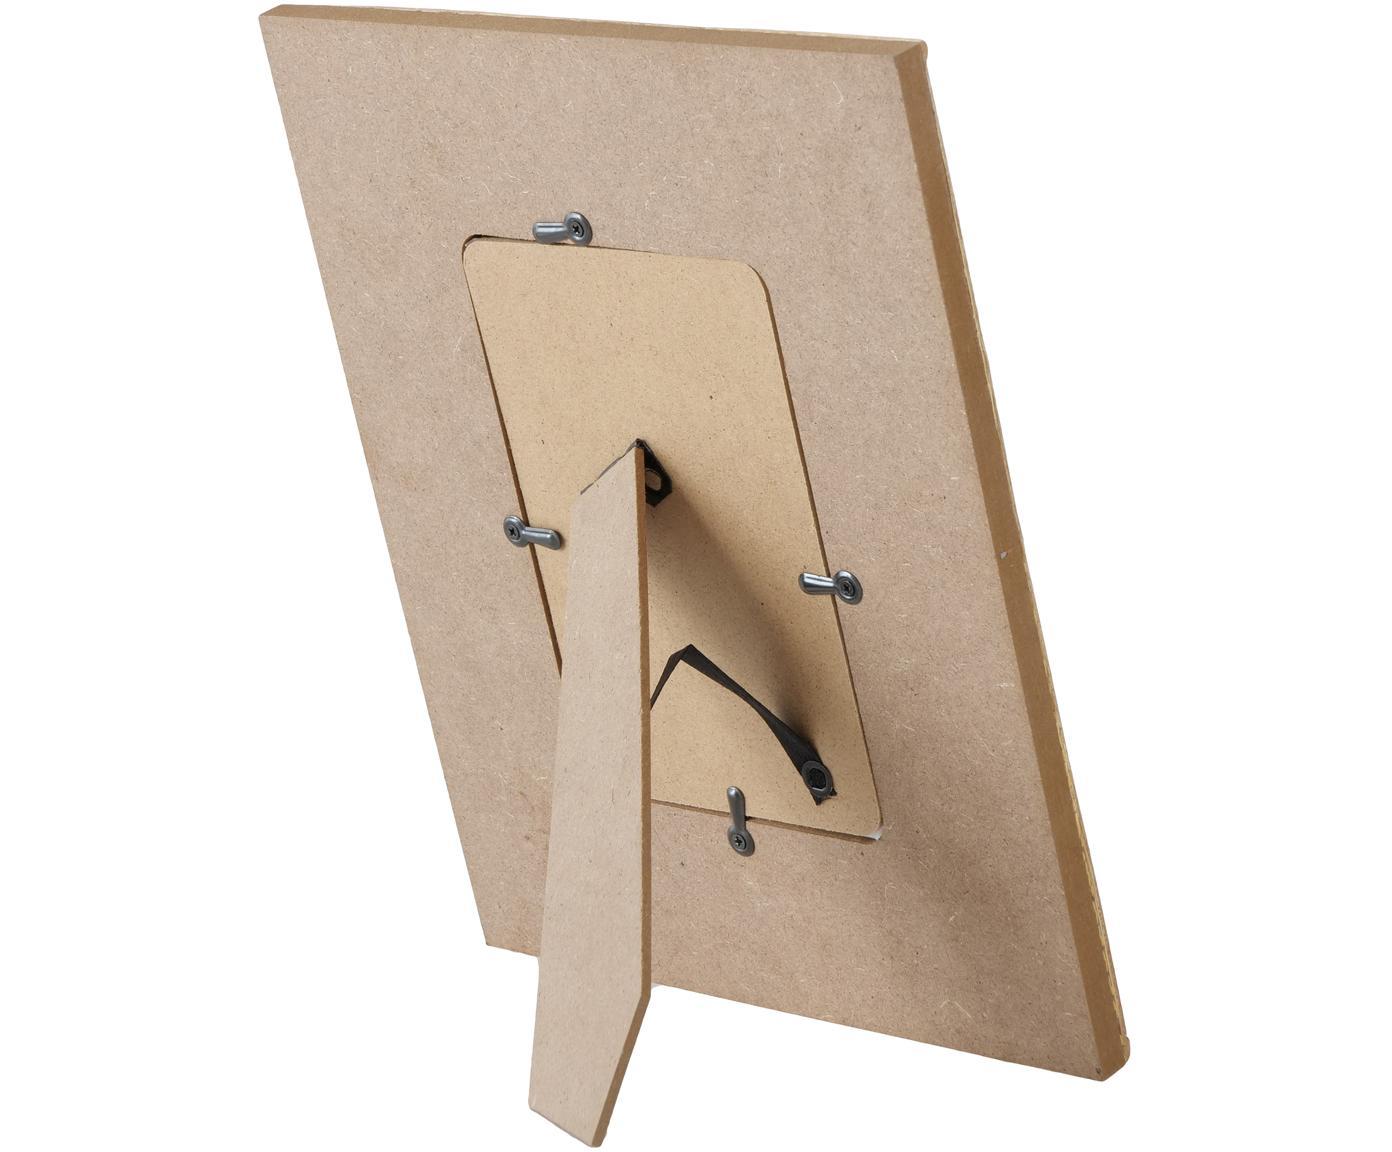 Cornice Vienna, Materiale sintetico, Beige, Larg. 21 x Alt. 26 cm